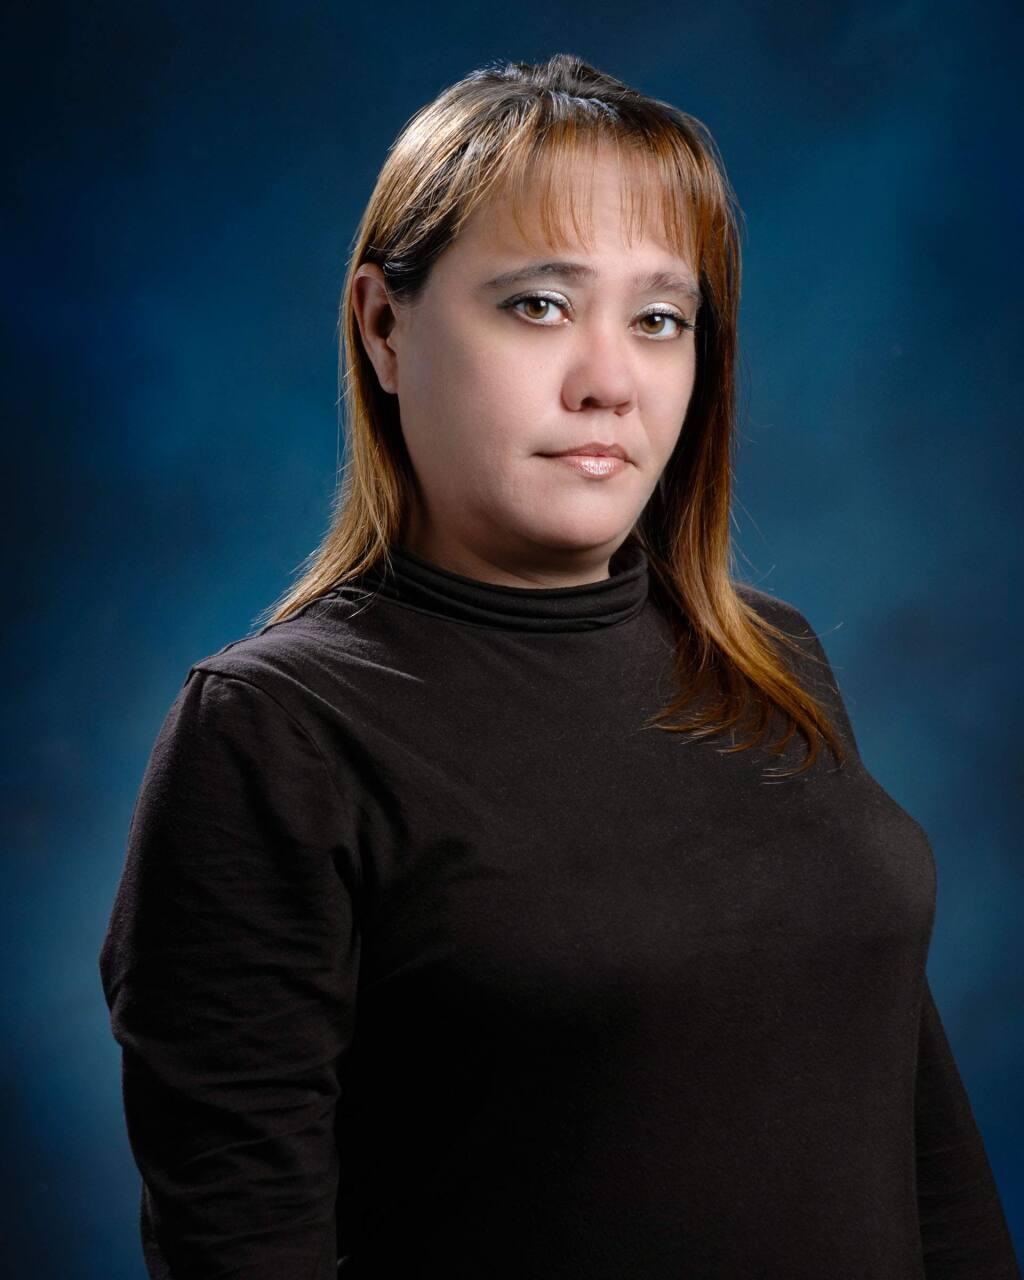 Vanessa Contreras, President, McRoskey Mattress